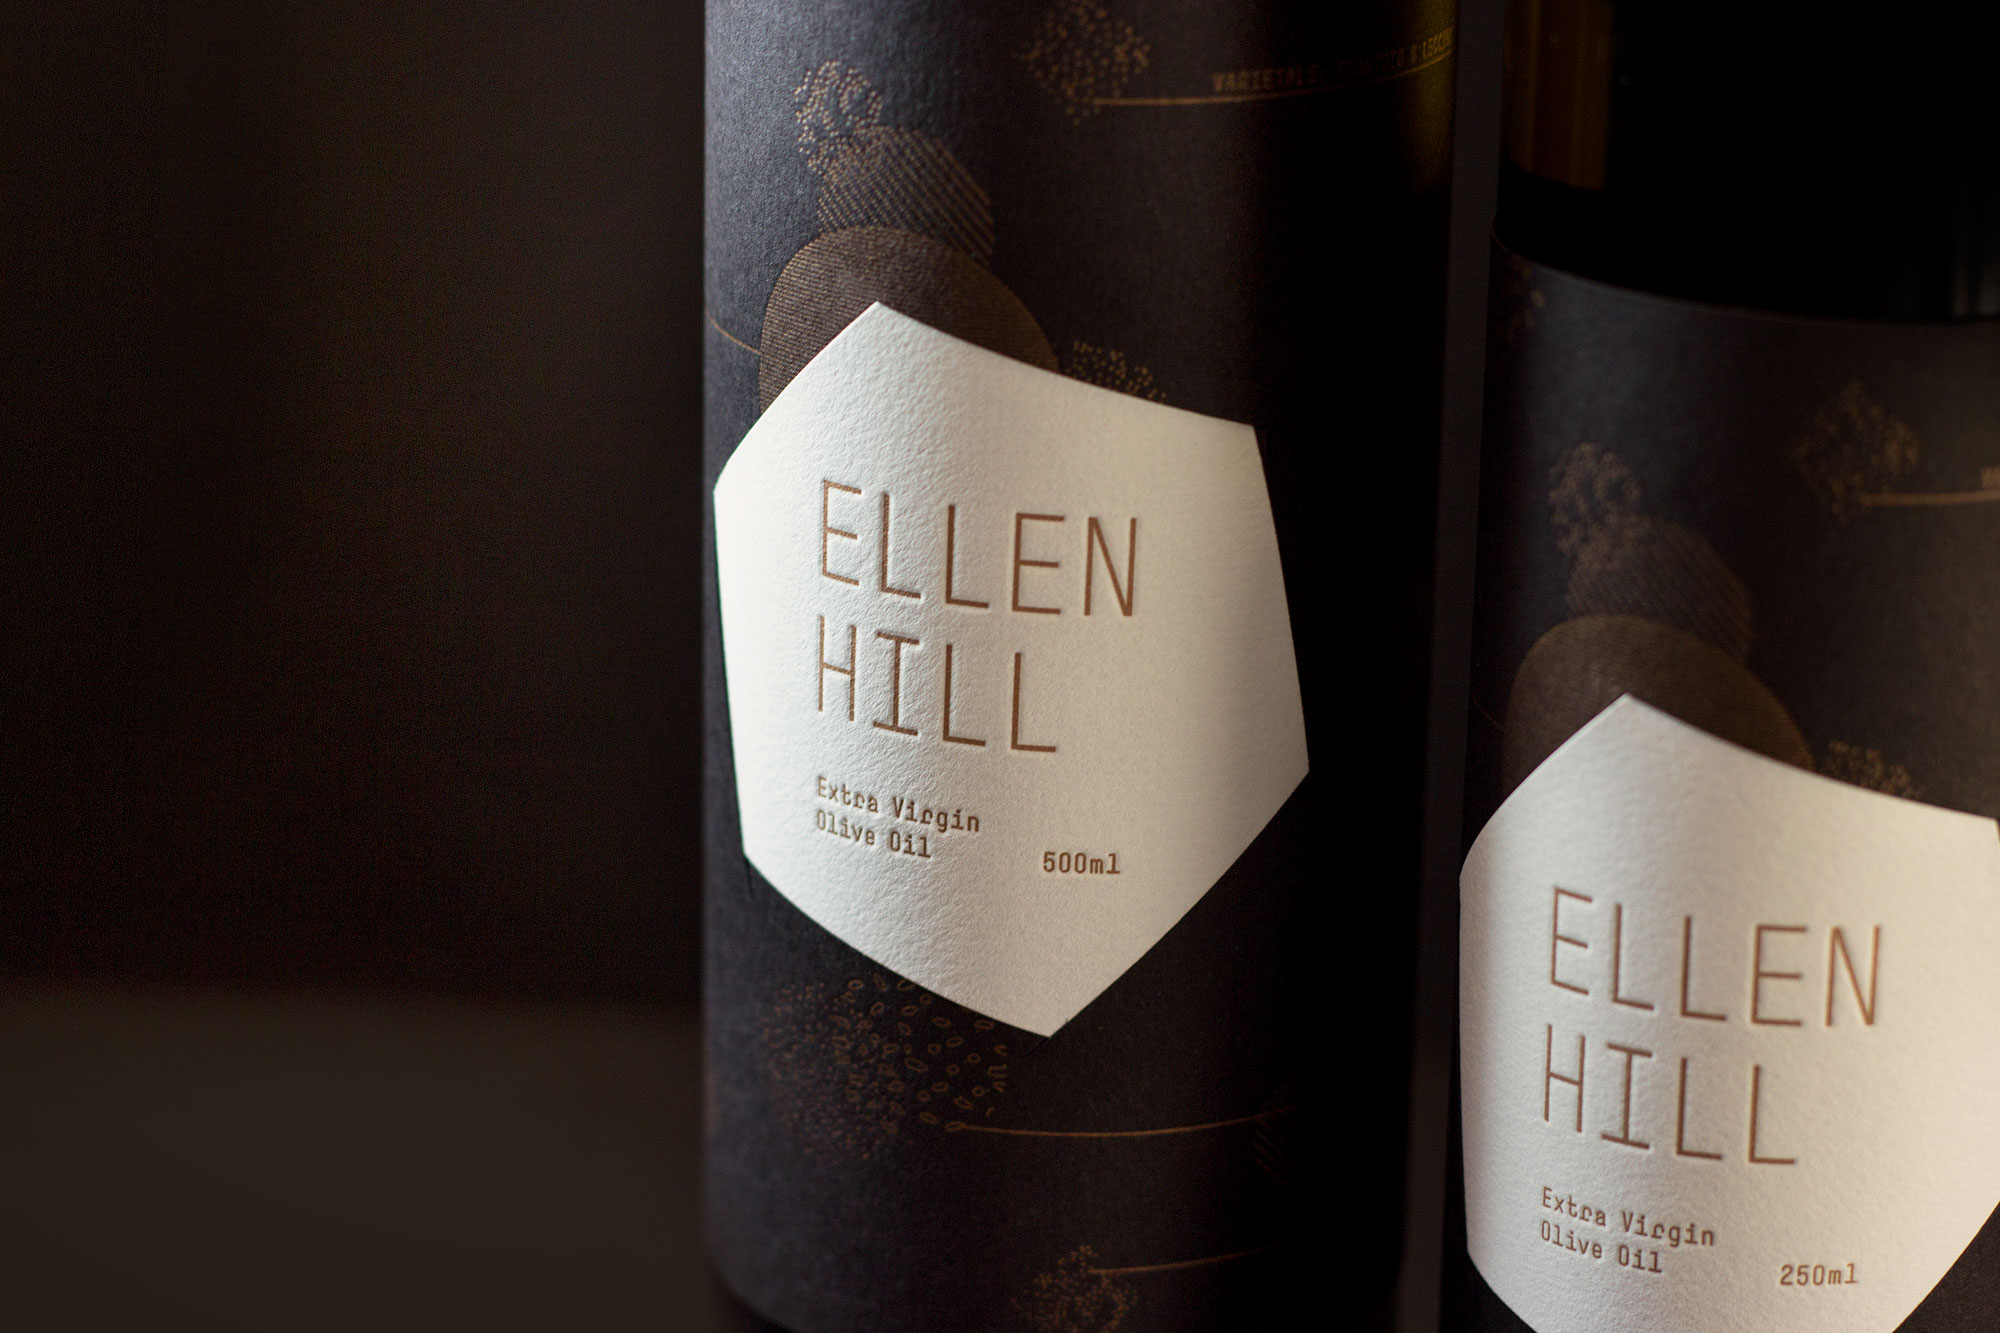 EllenHill2